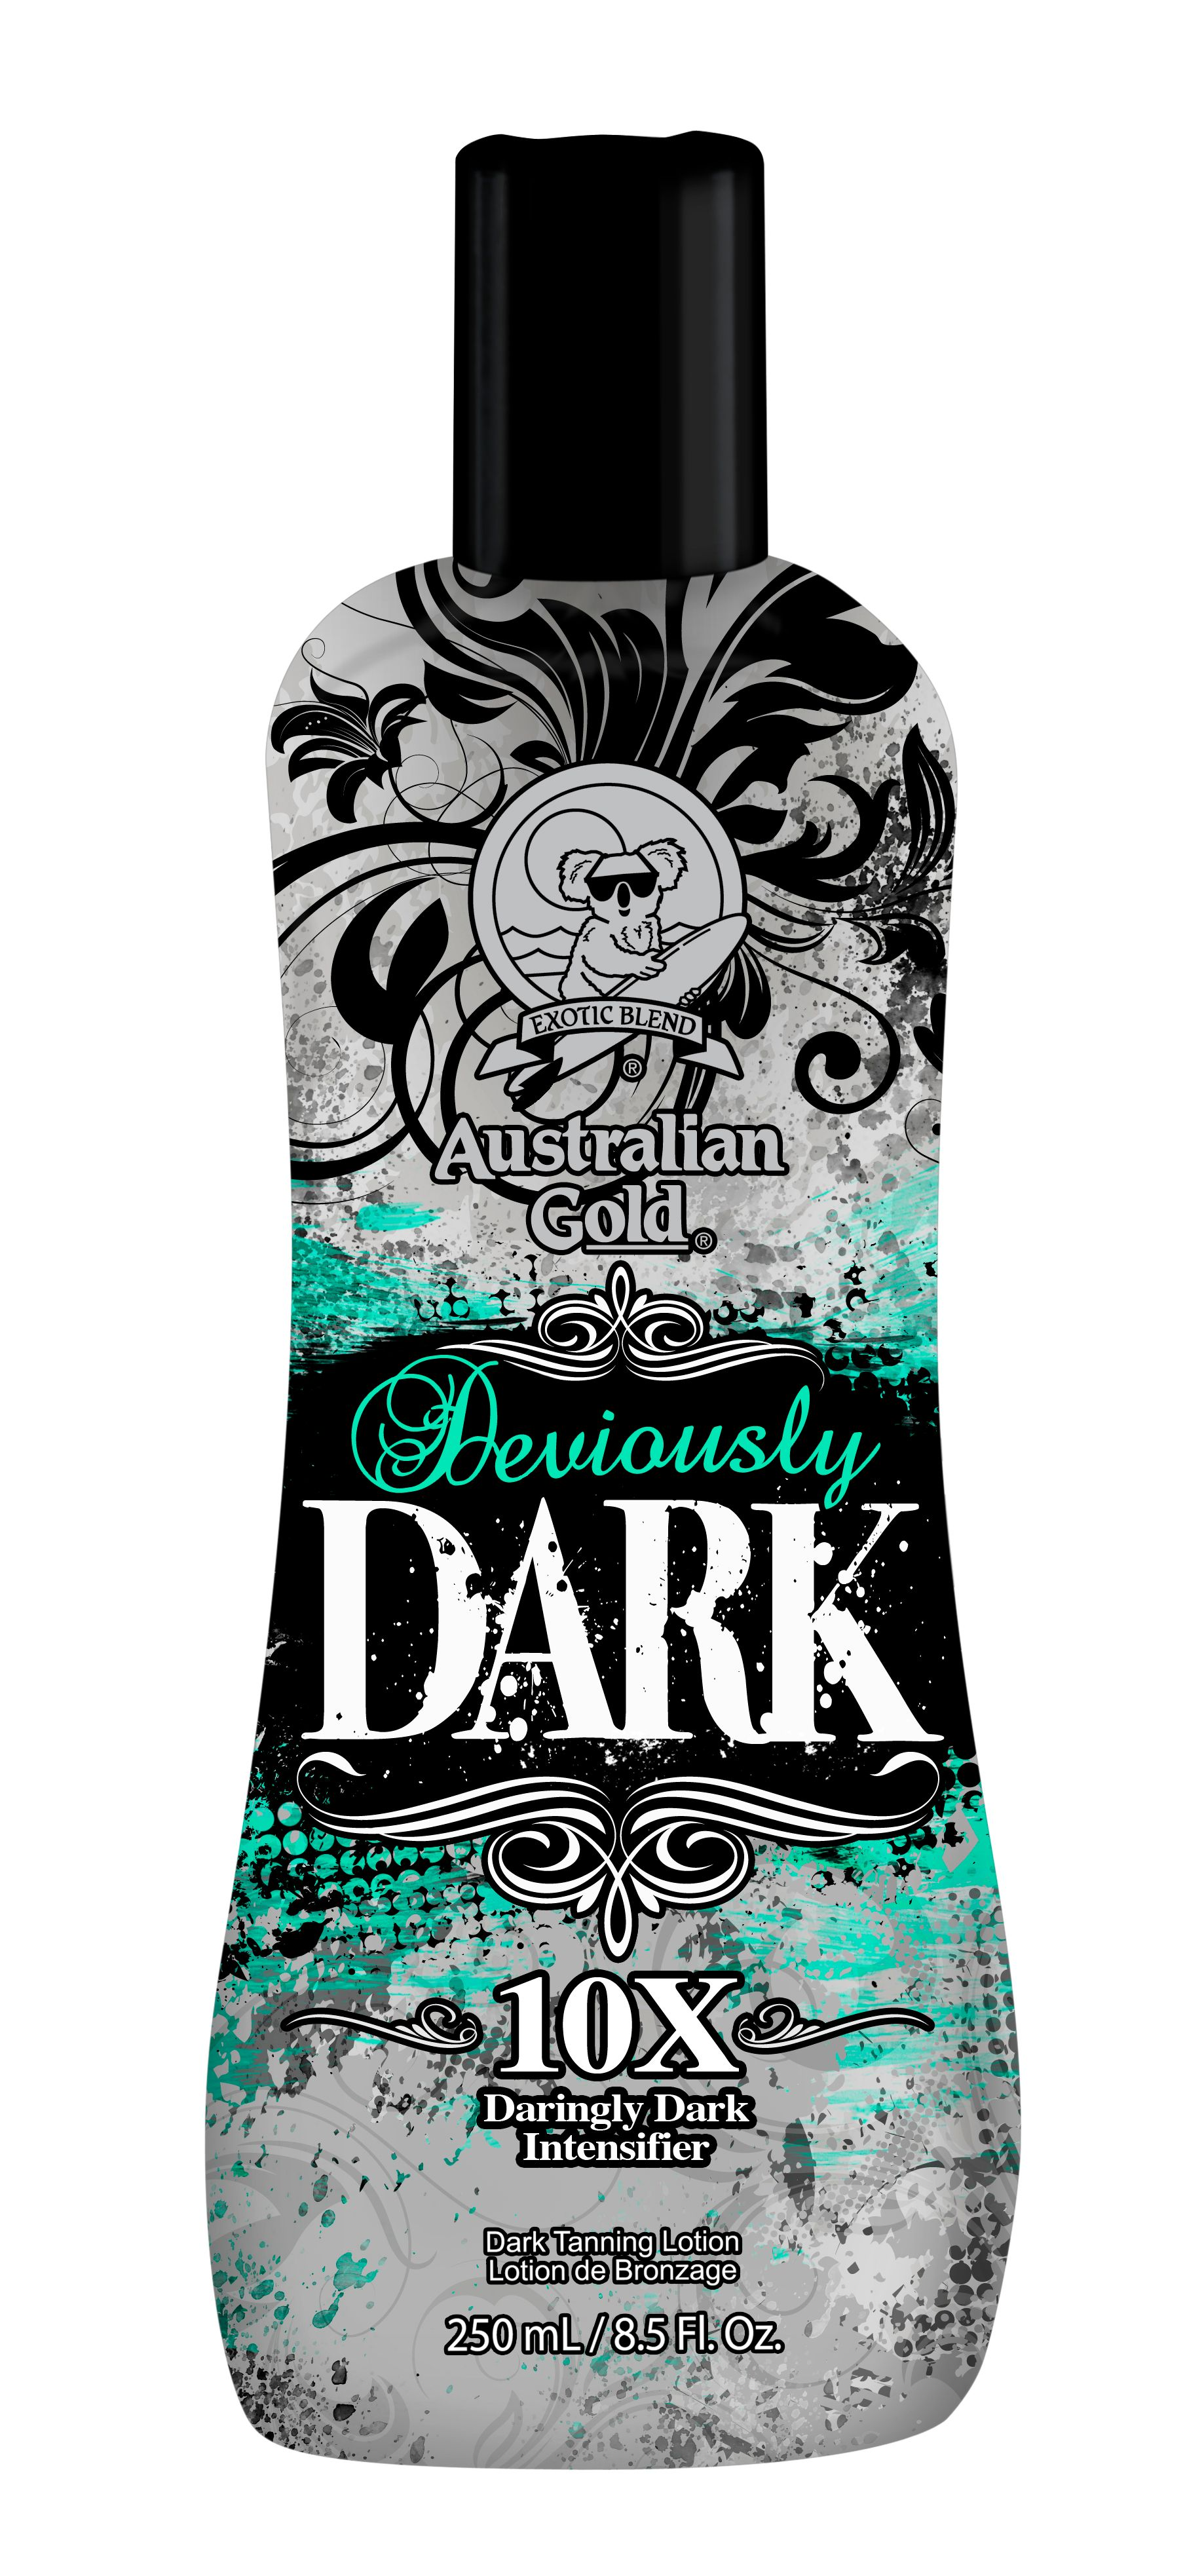 Australian Gold - Deviously Dark Bronzing Lotion 250 ml